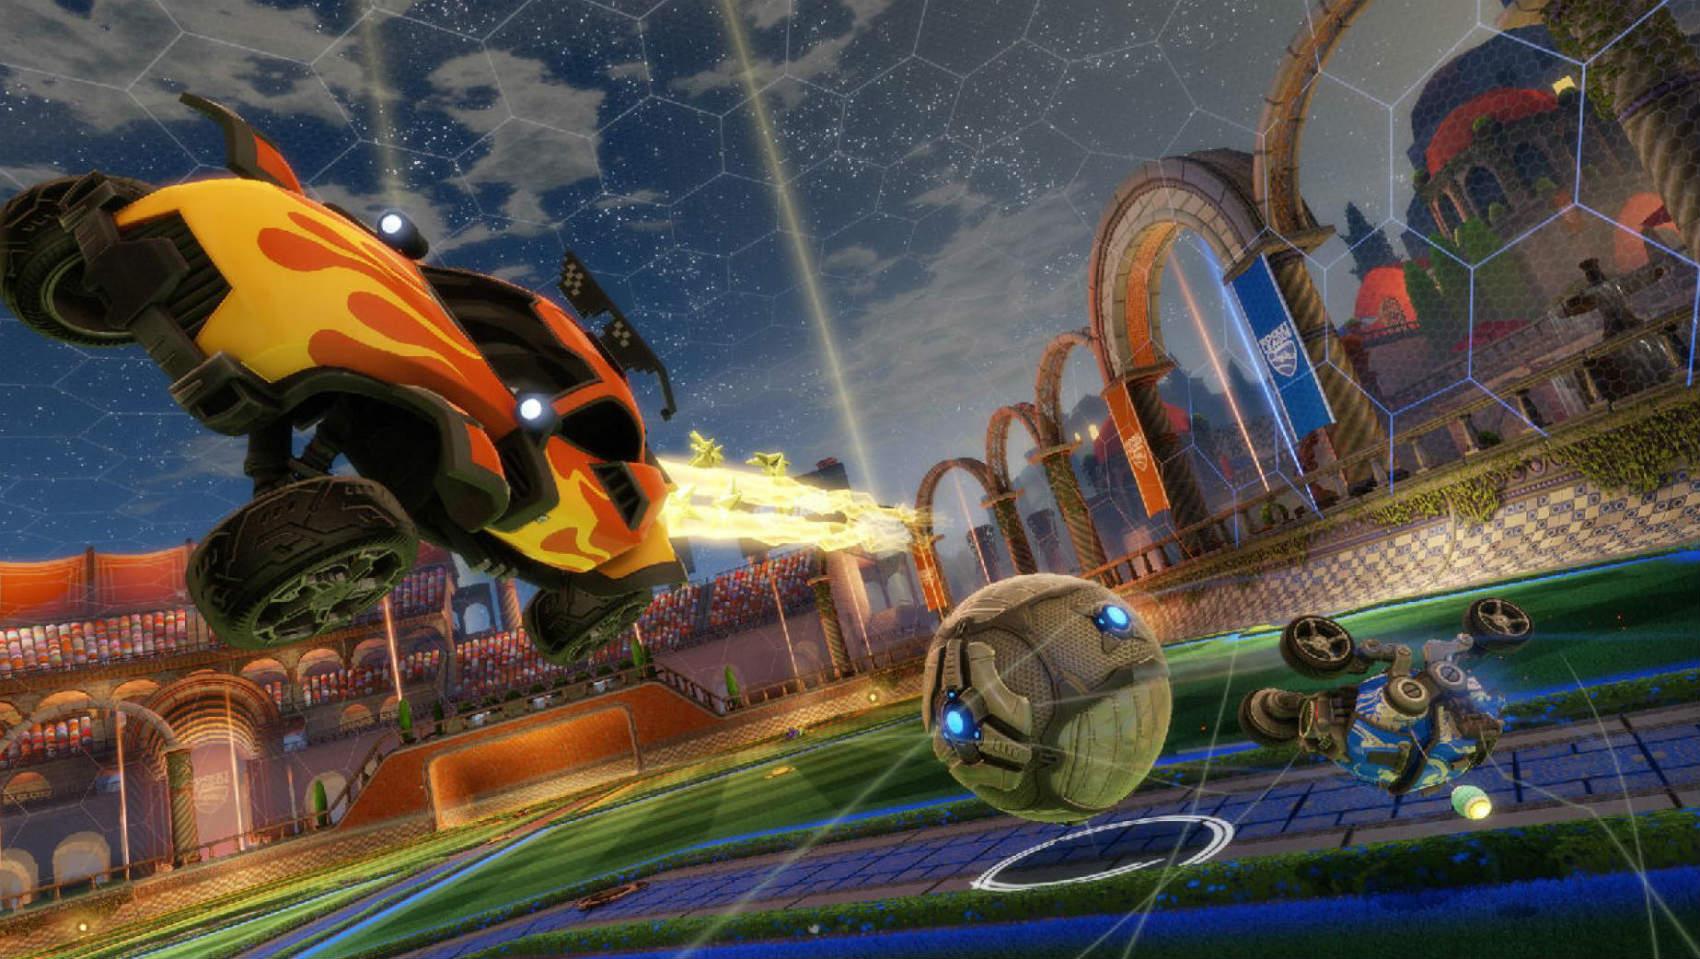 10: Rocket League – PlayStation 4, Xbox One, PC (2015)